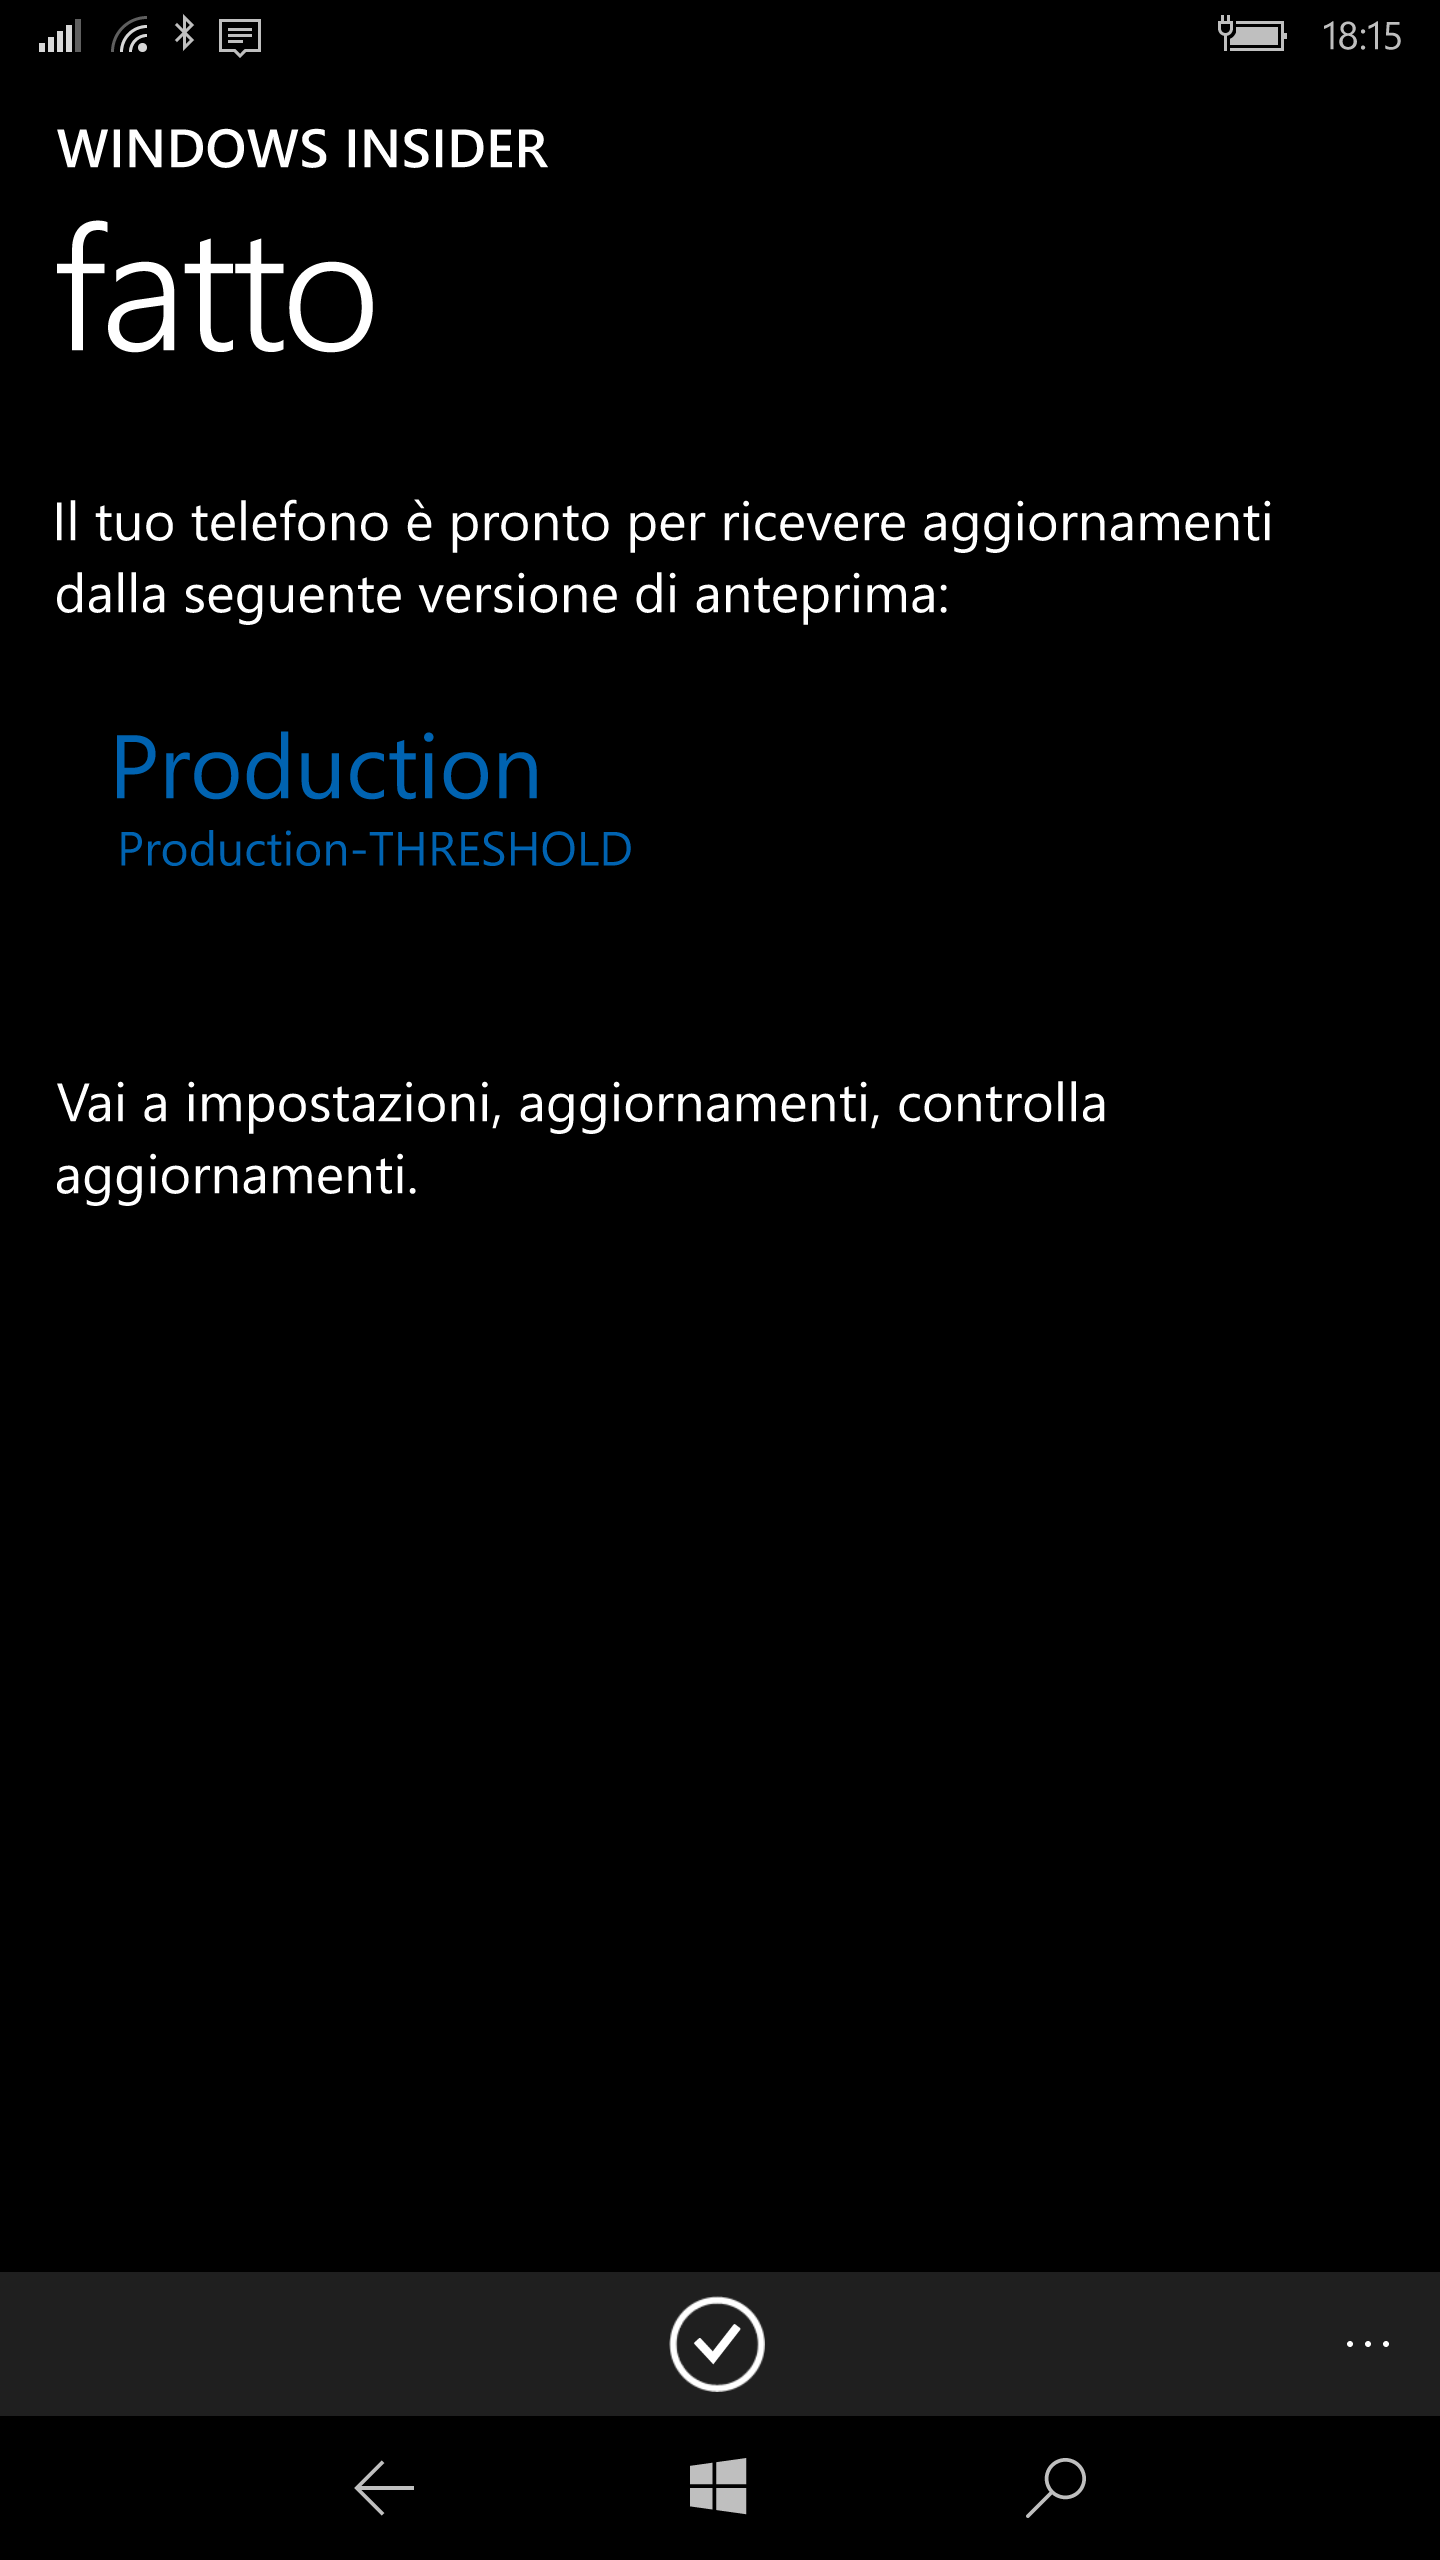 Windows Insider 4